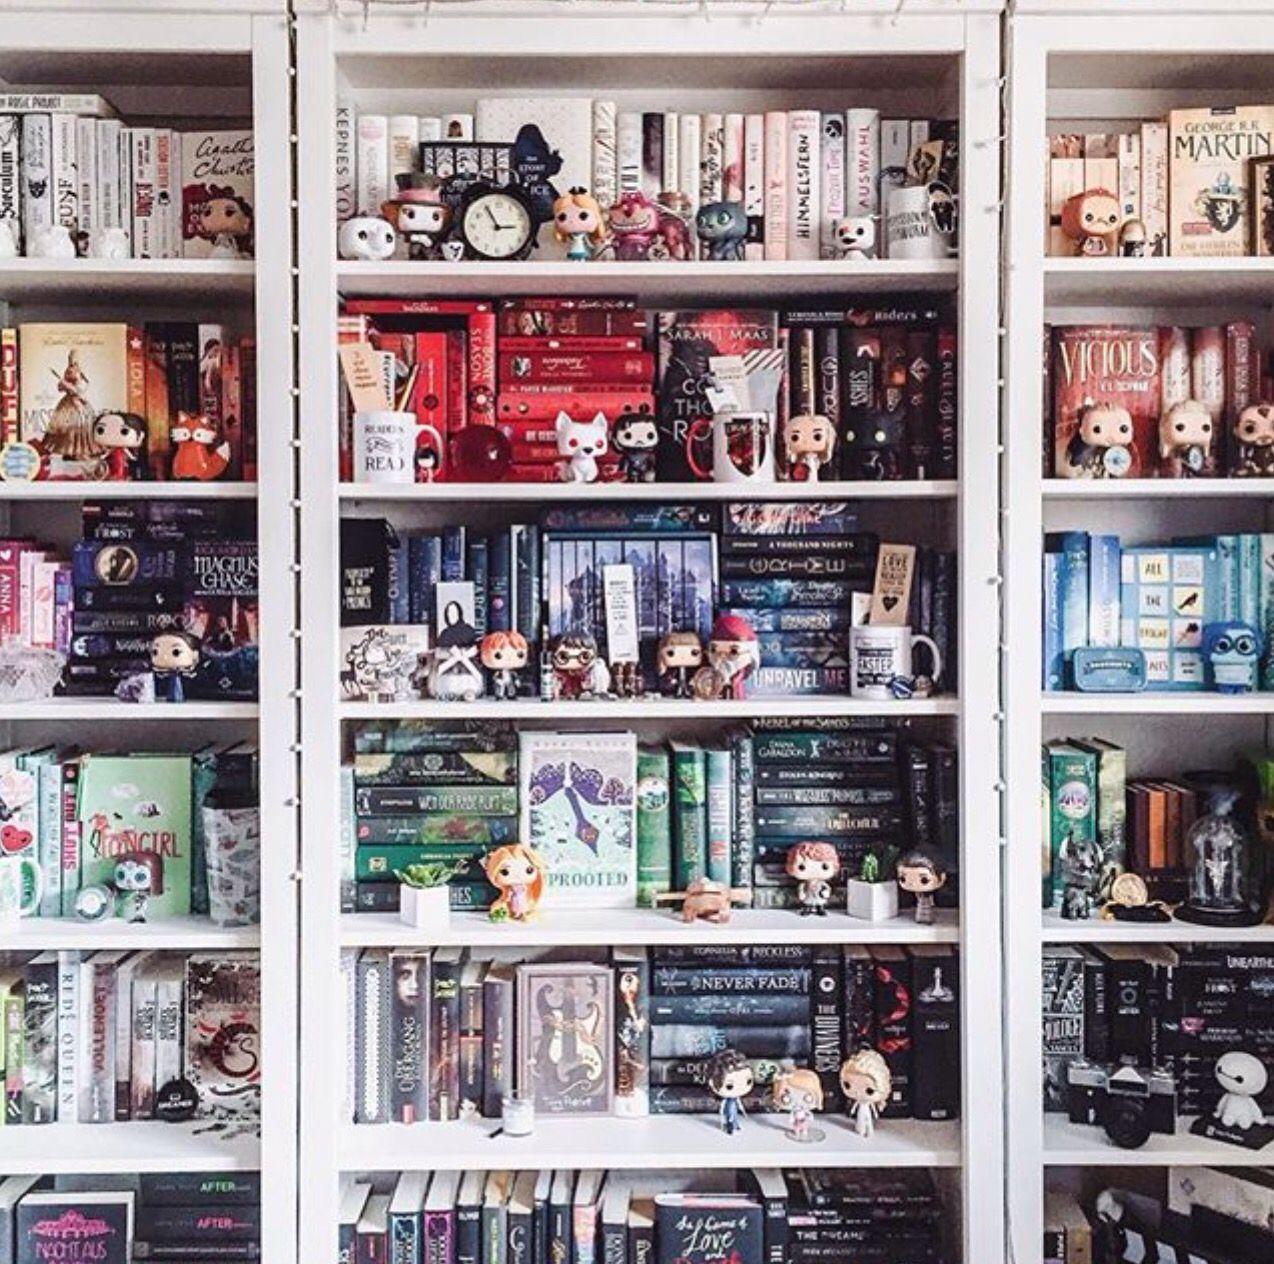 Co colour coordinated bookshelf - Bookshelf And Funko Pop